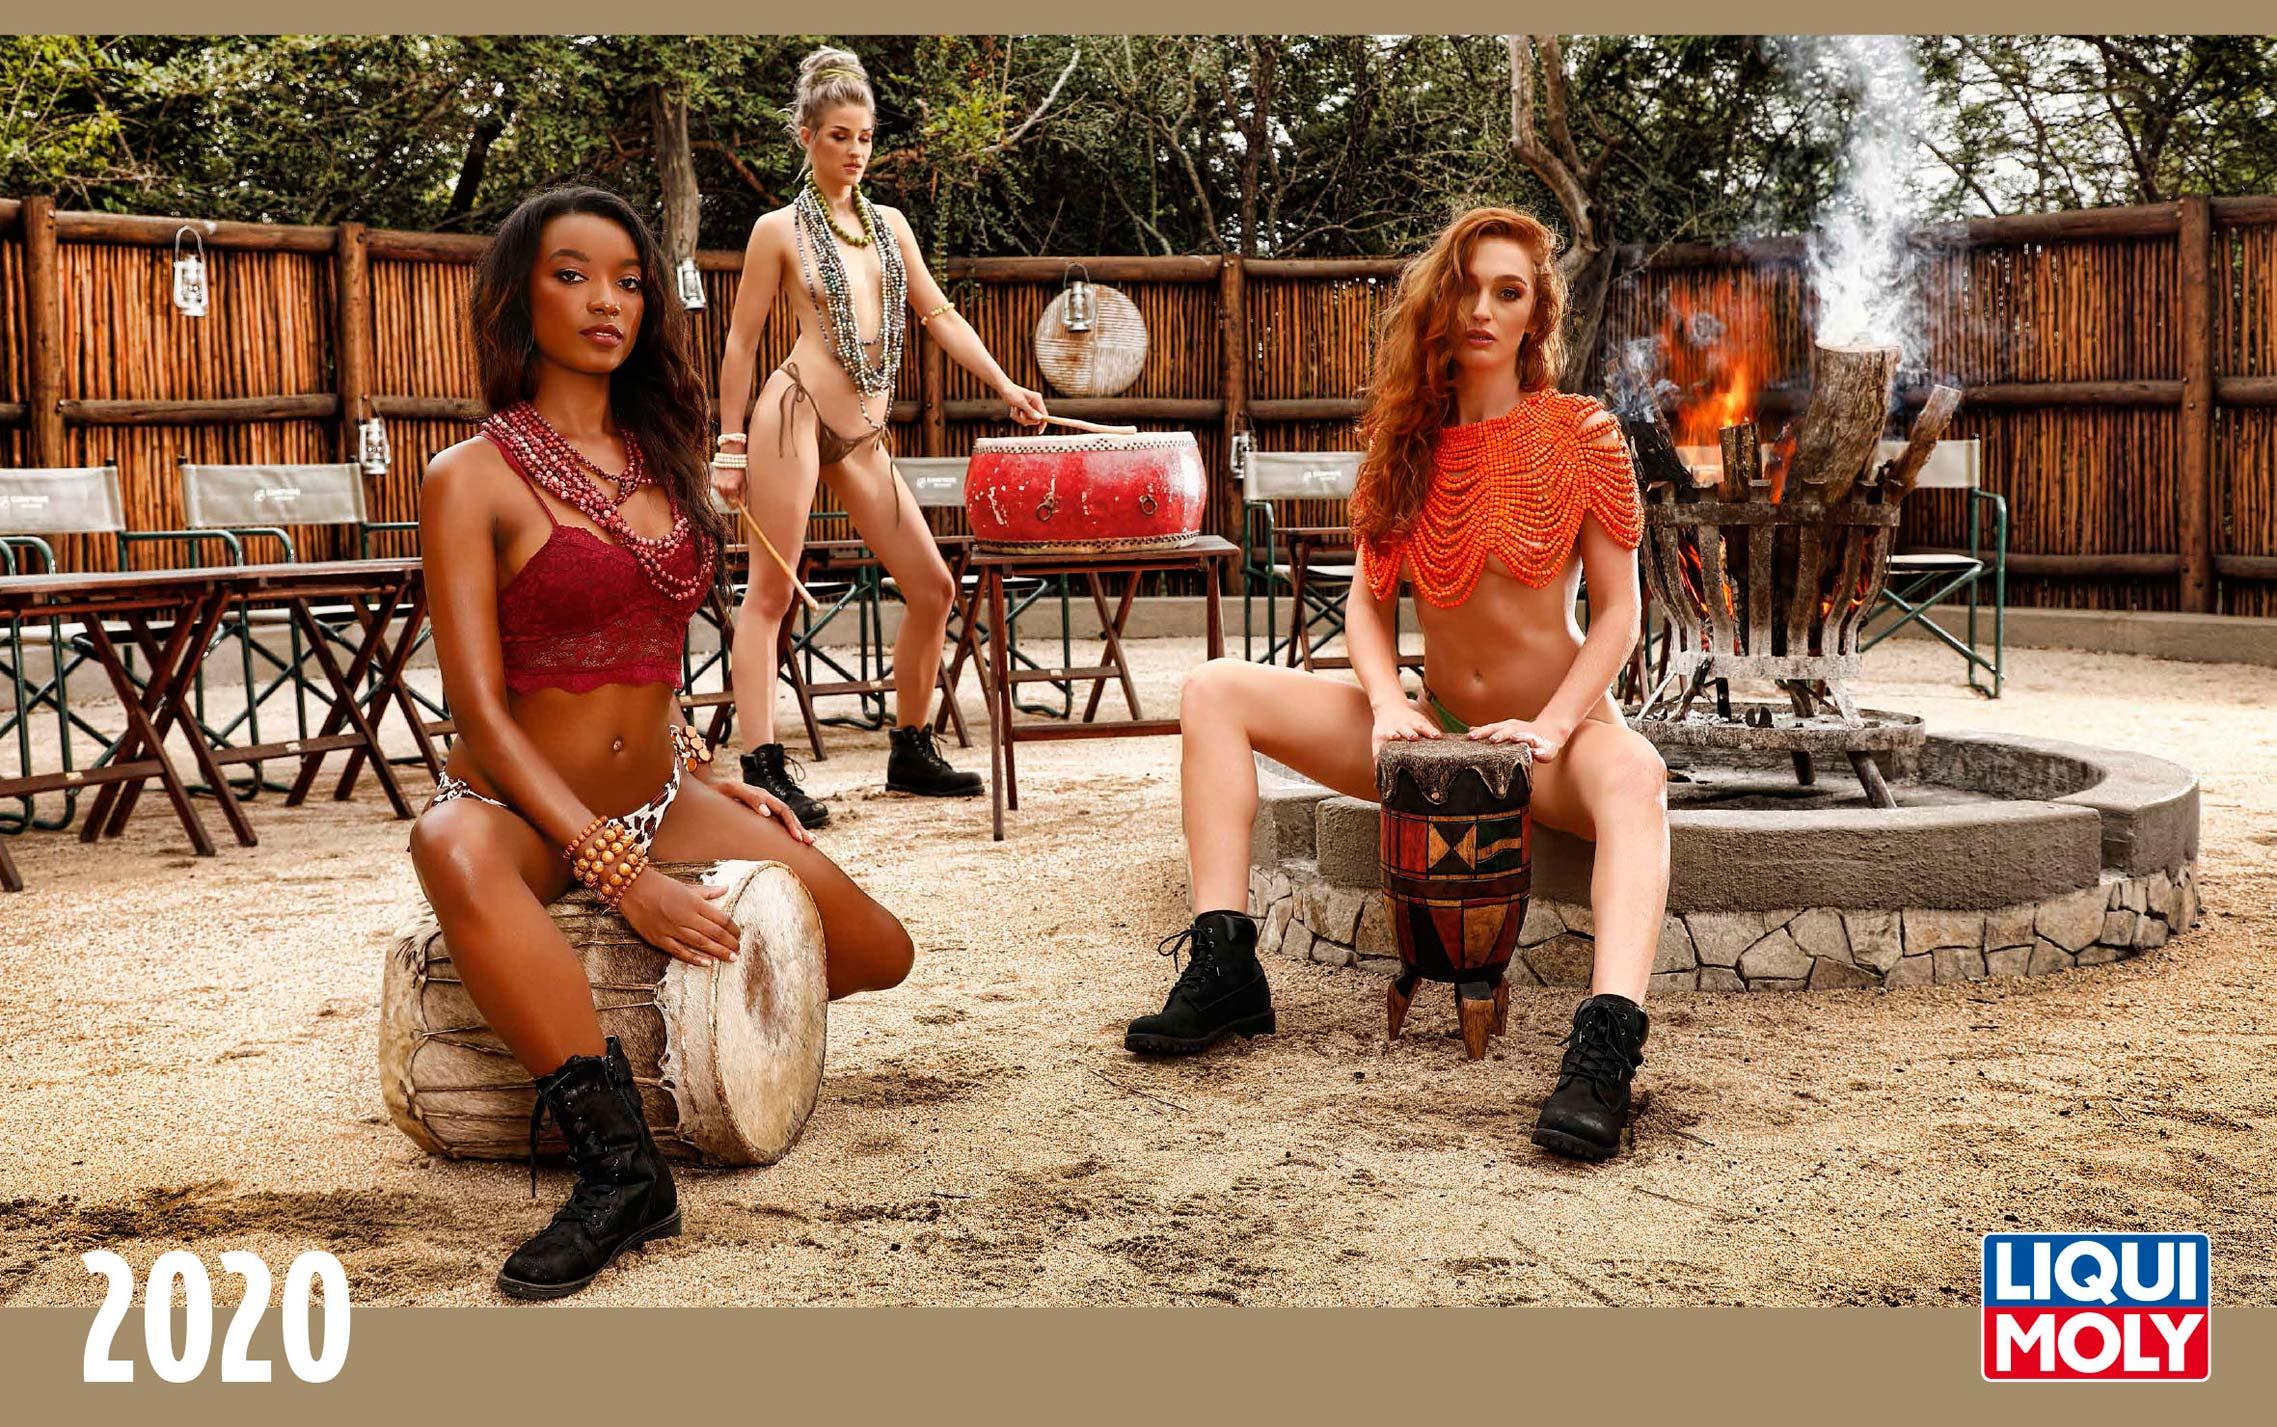 Календарь с девушками автоконцерна Liqui Moly, 2020 год / обложка